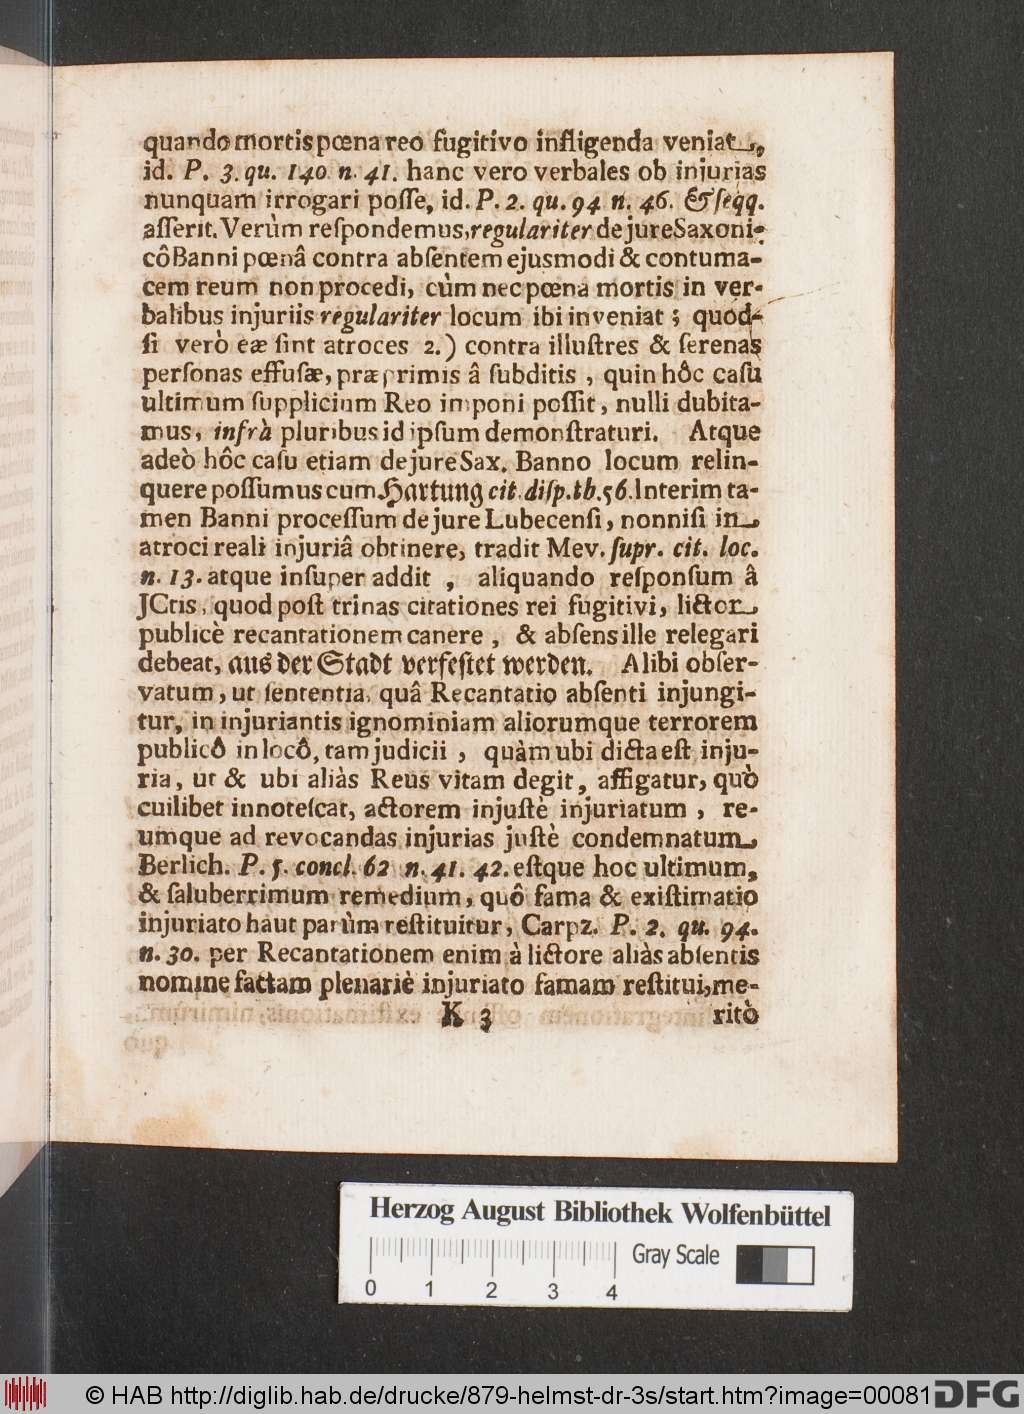 https://diglib.hab.de/drucke/879-helmst-dr-3s/00081.jpg